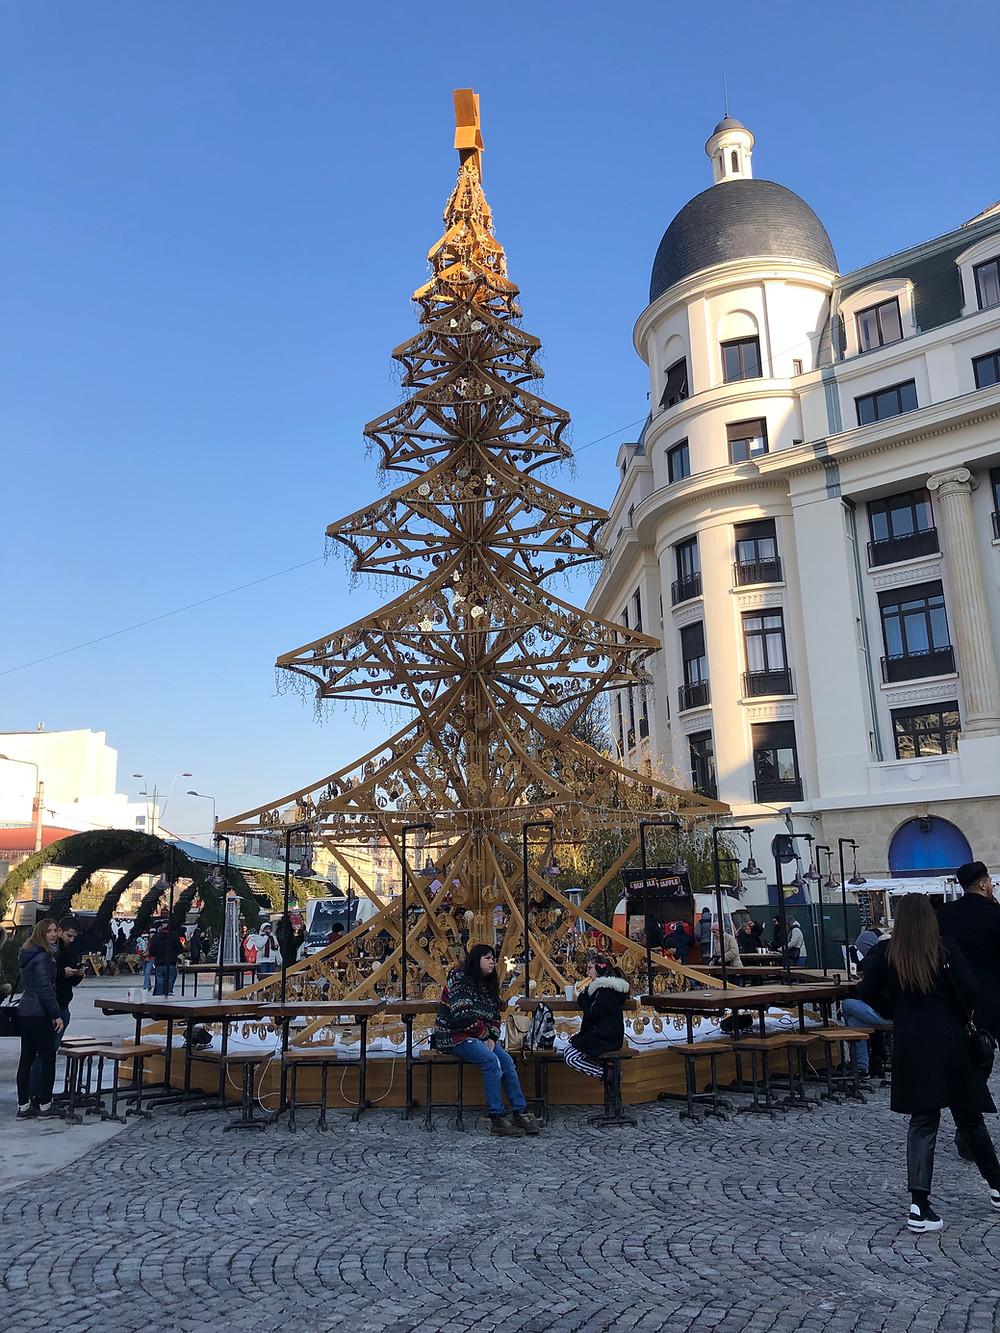 Unlit Christmas Tree in Bucharest